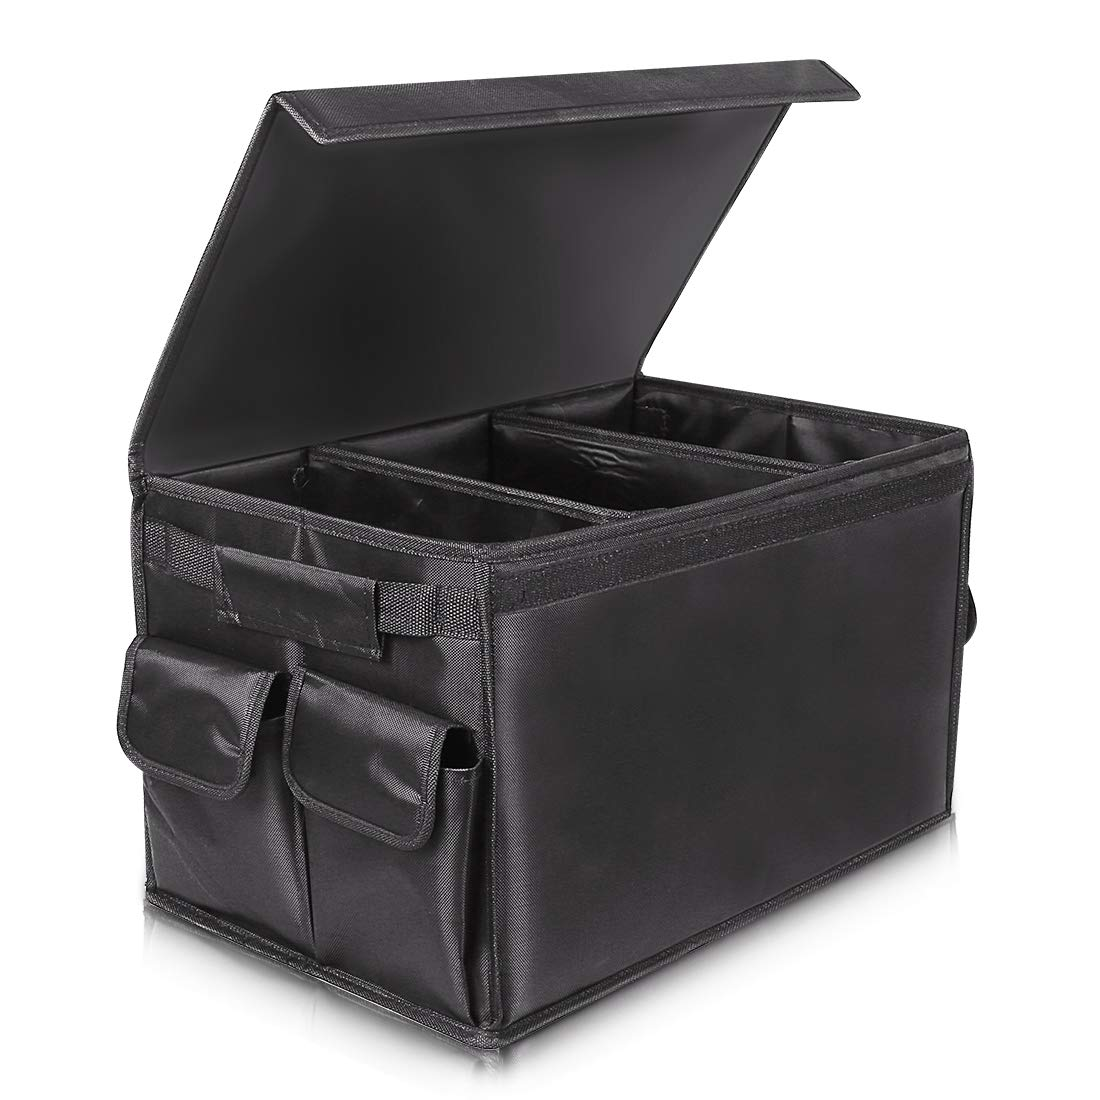 Car Boot Organiser Folding Car Organiser Trunk Organizer Comtechlogic/® CM-4075 2 In 1 Shopping Tidy Heavy Duty Collapsible Foldable Storage Auto Car Storage Organiser Foldable Storage Boot Organiser Box Car Boot Bag